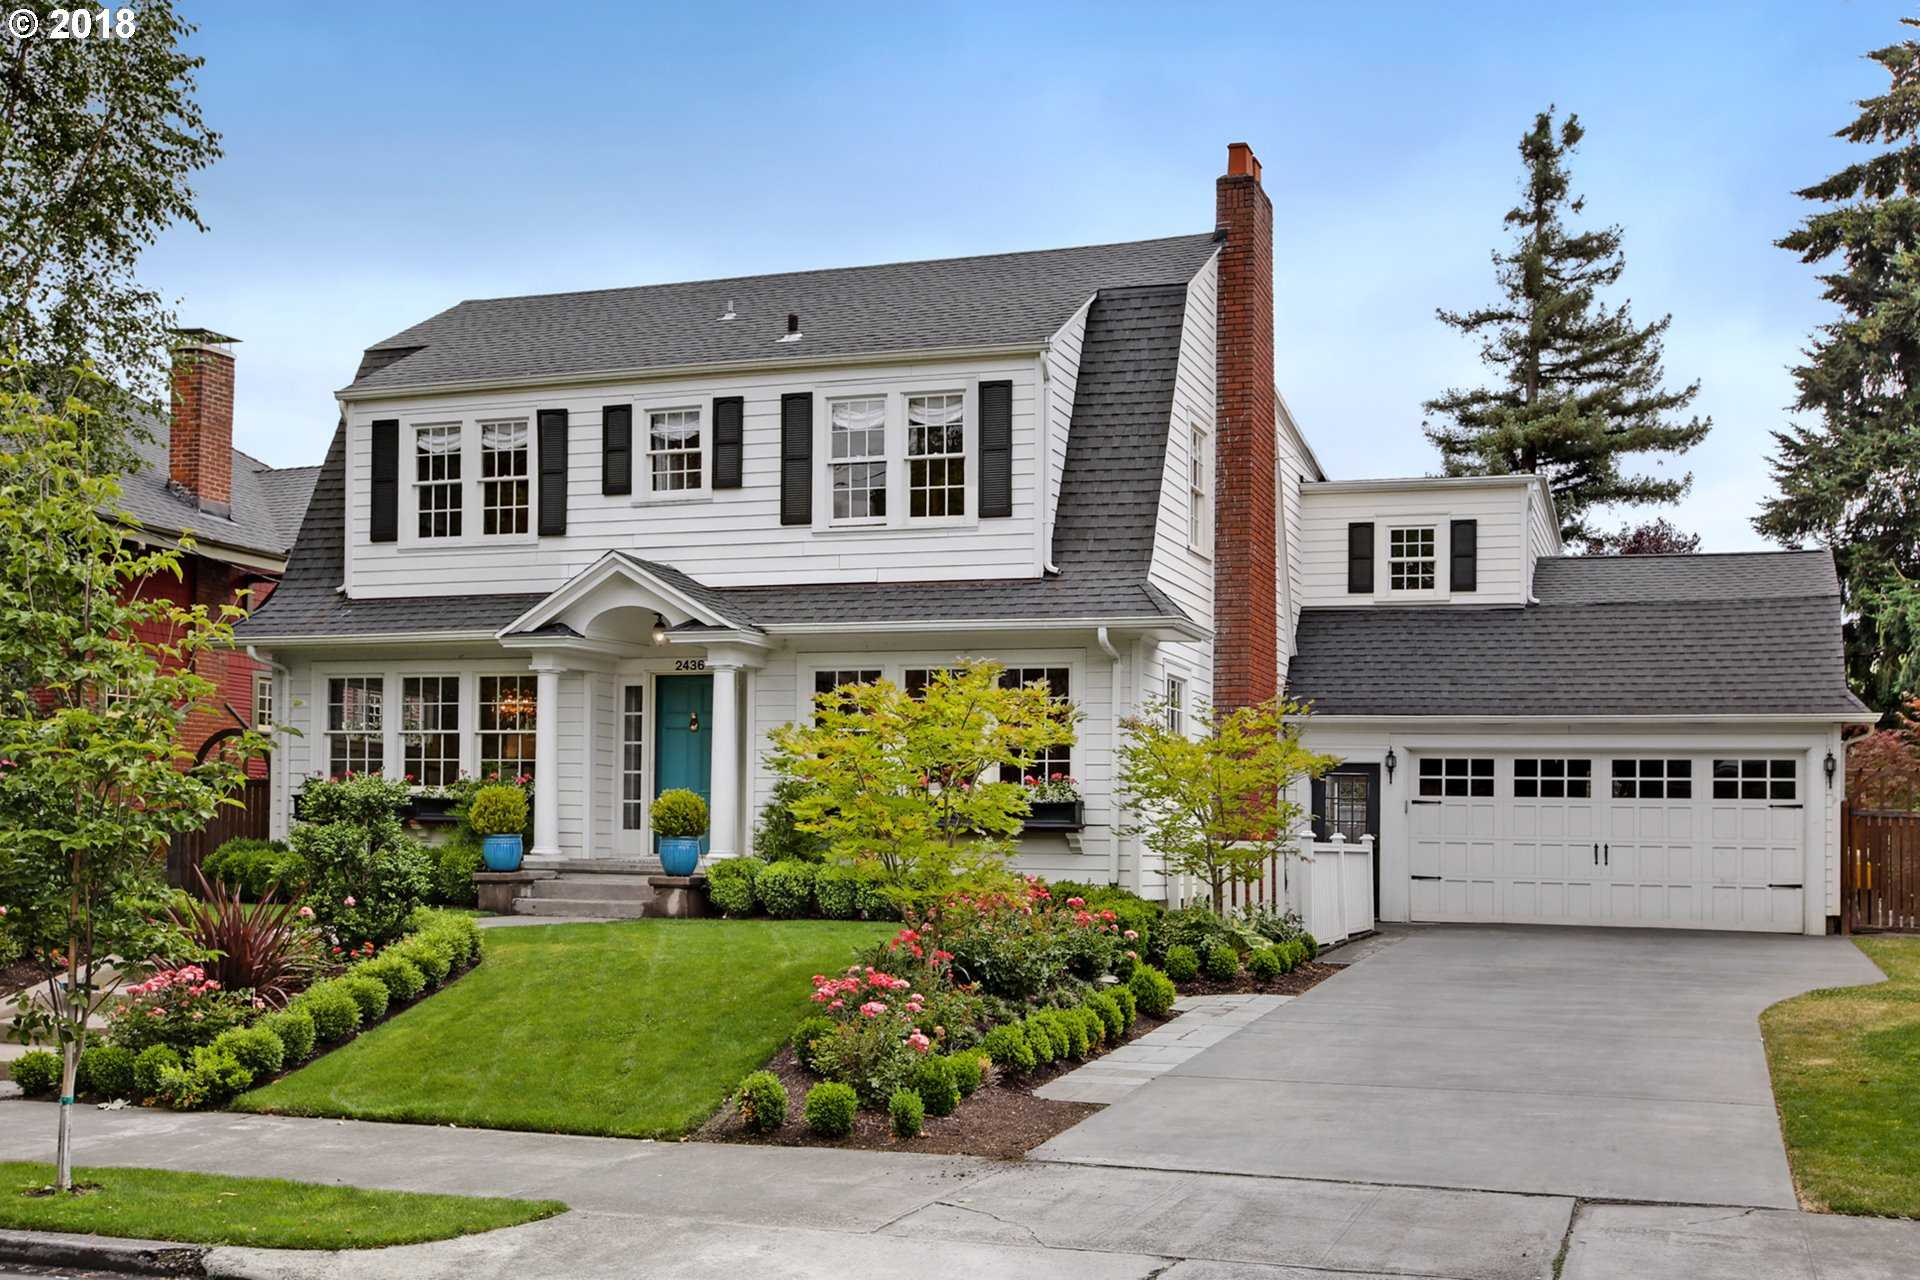 $1,495,000 - 5Br/5Ba -  for Sale in Irvington/alameda, Portland